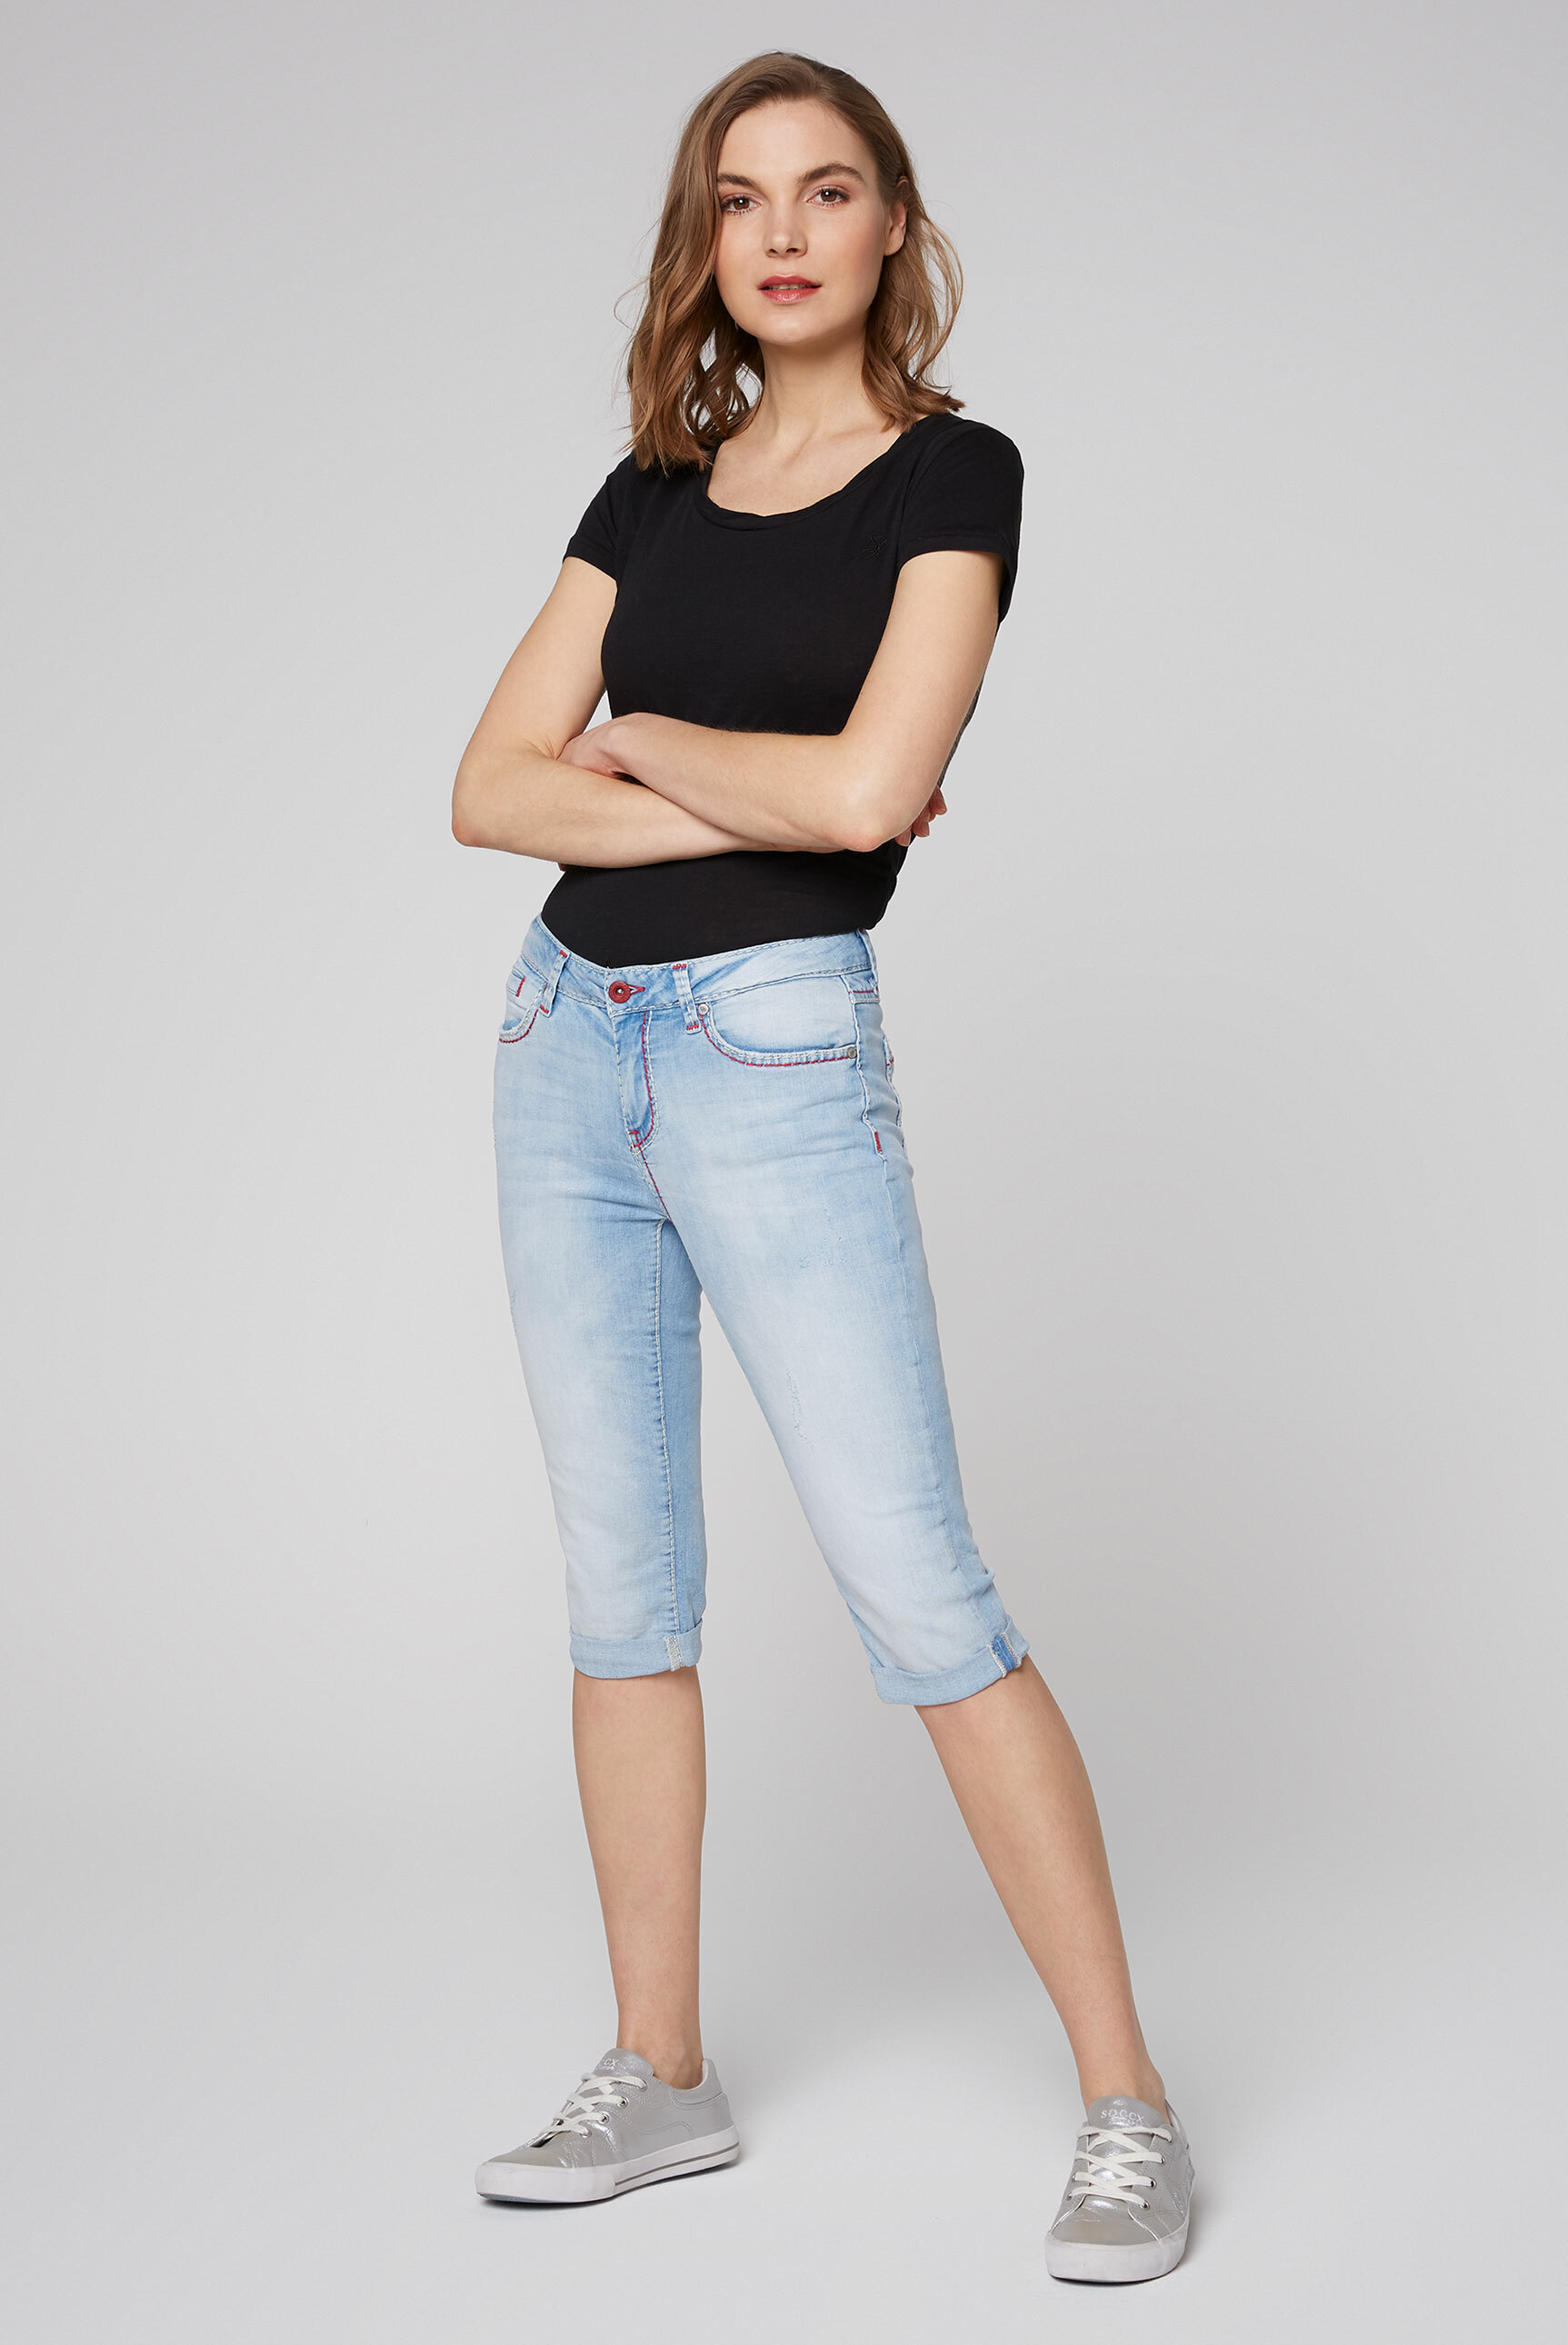 Jeans Bermuda RO:MY im Sunny Bleached Look